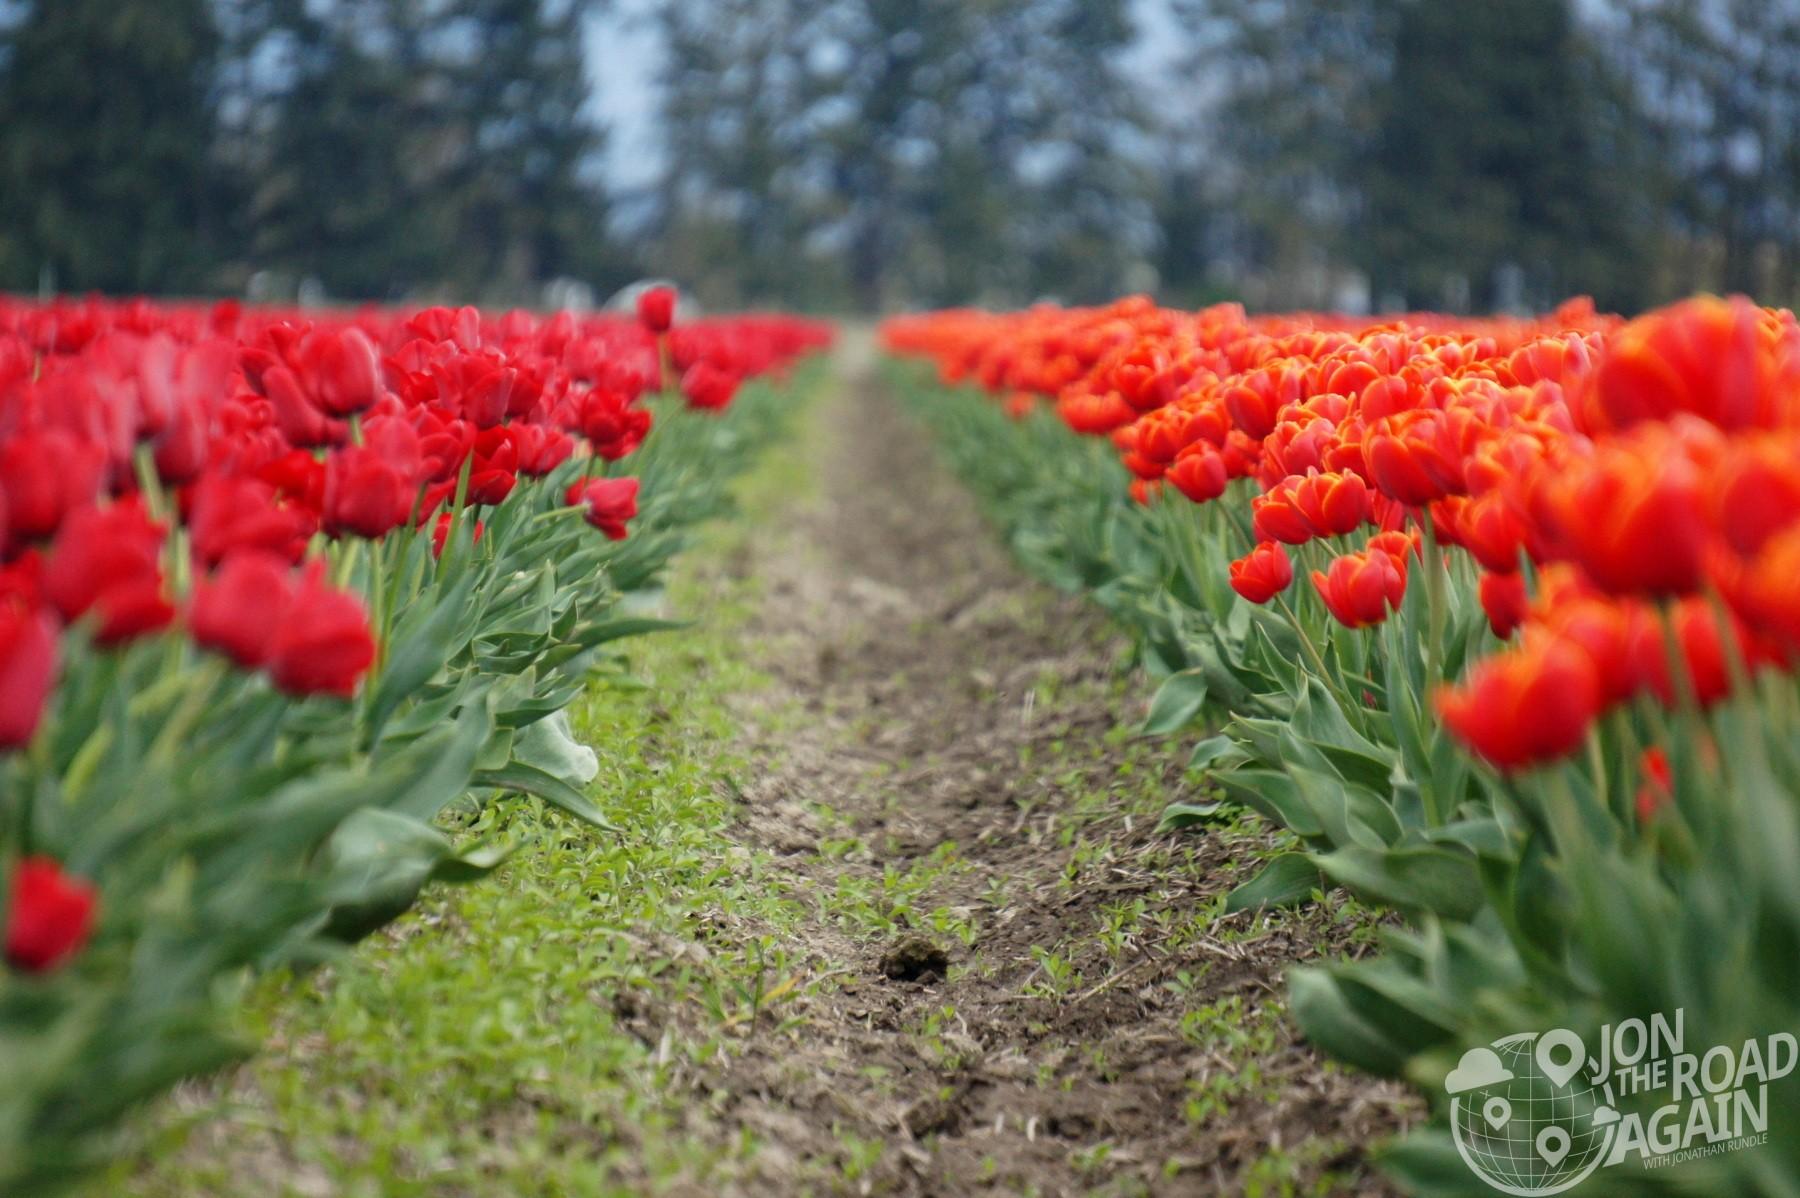 Mount Vernon (WA) United States  city photos : Skagit Valley Tulip Festival in Mount Vernon, WA Jon the Road Again